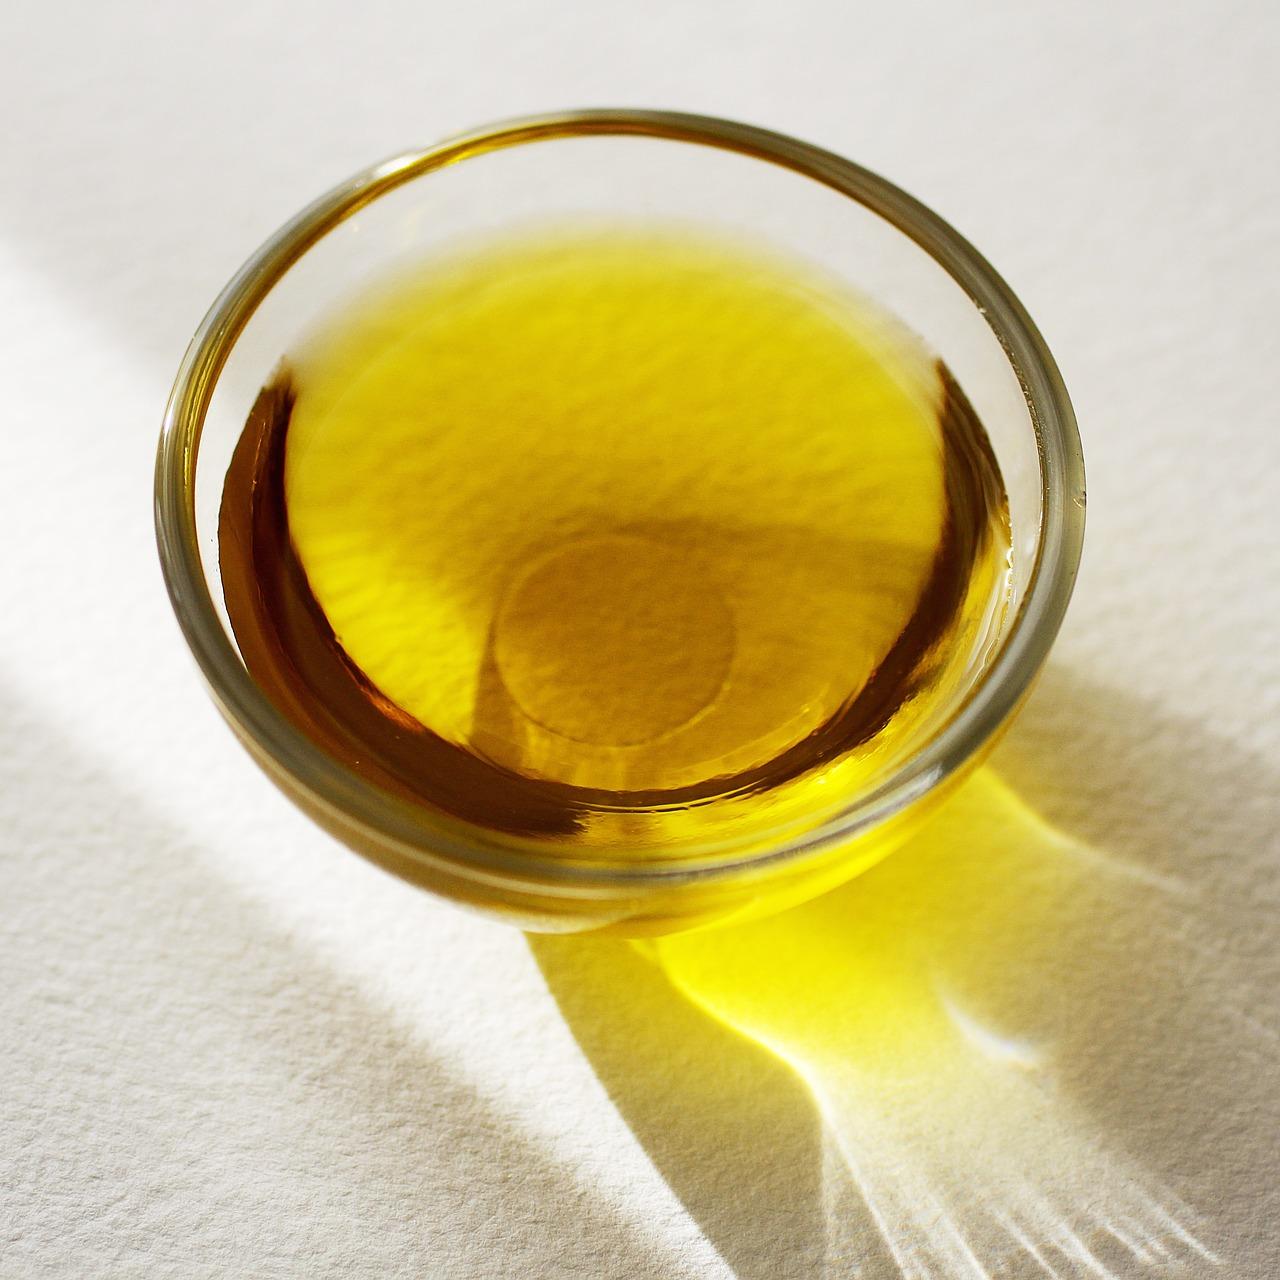 Aceite, vegetal esencial aventuracosmetica cosmetica natural